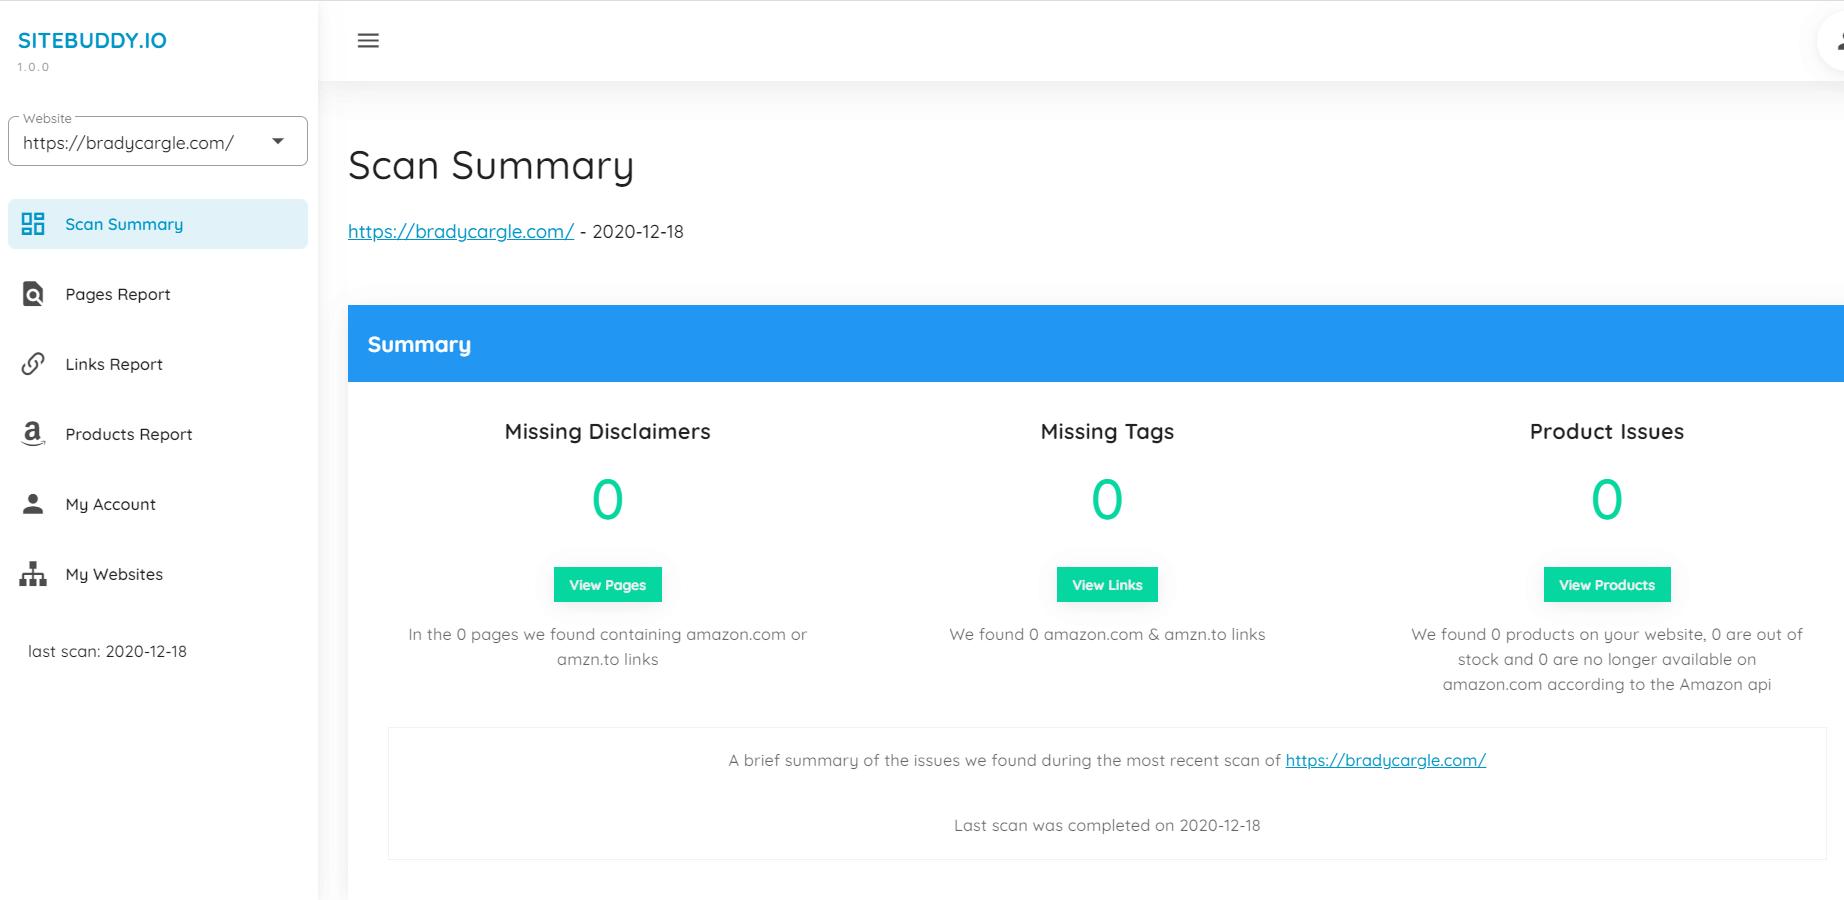 sitebuddy user dashboard